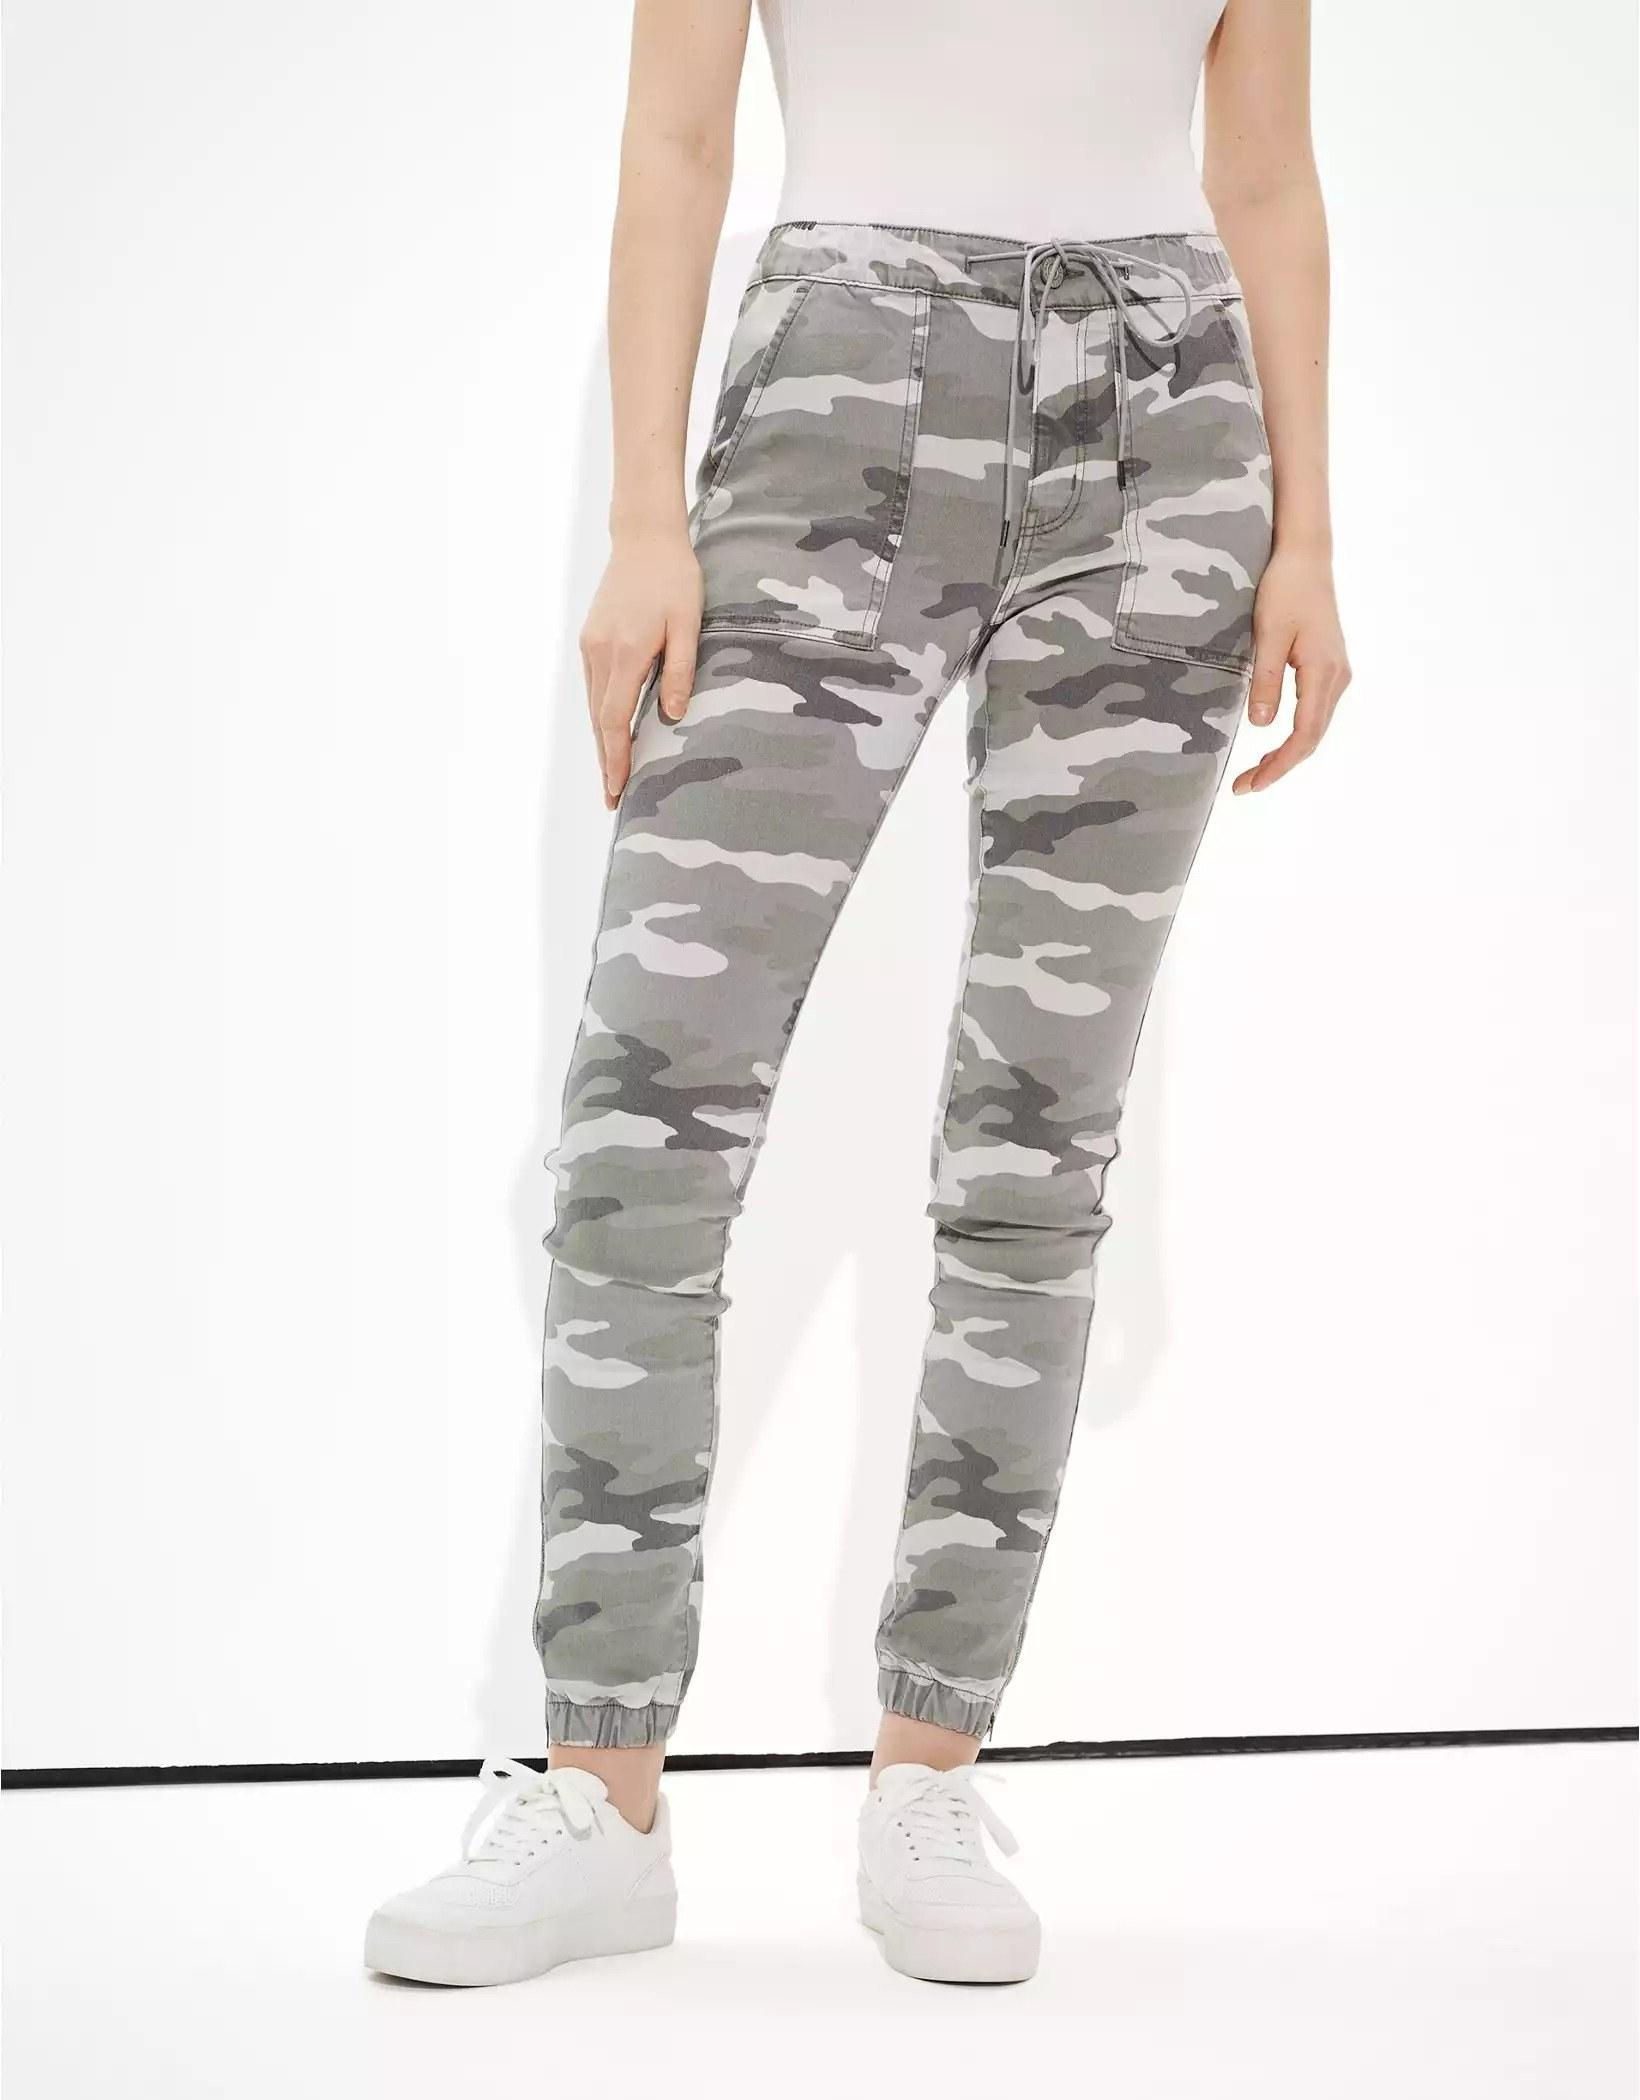 Model wearing camo pants